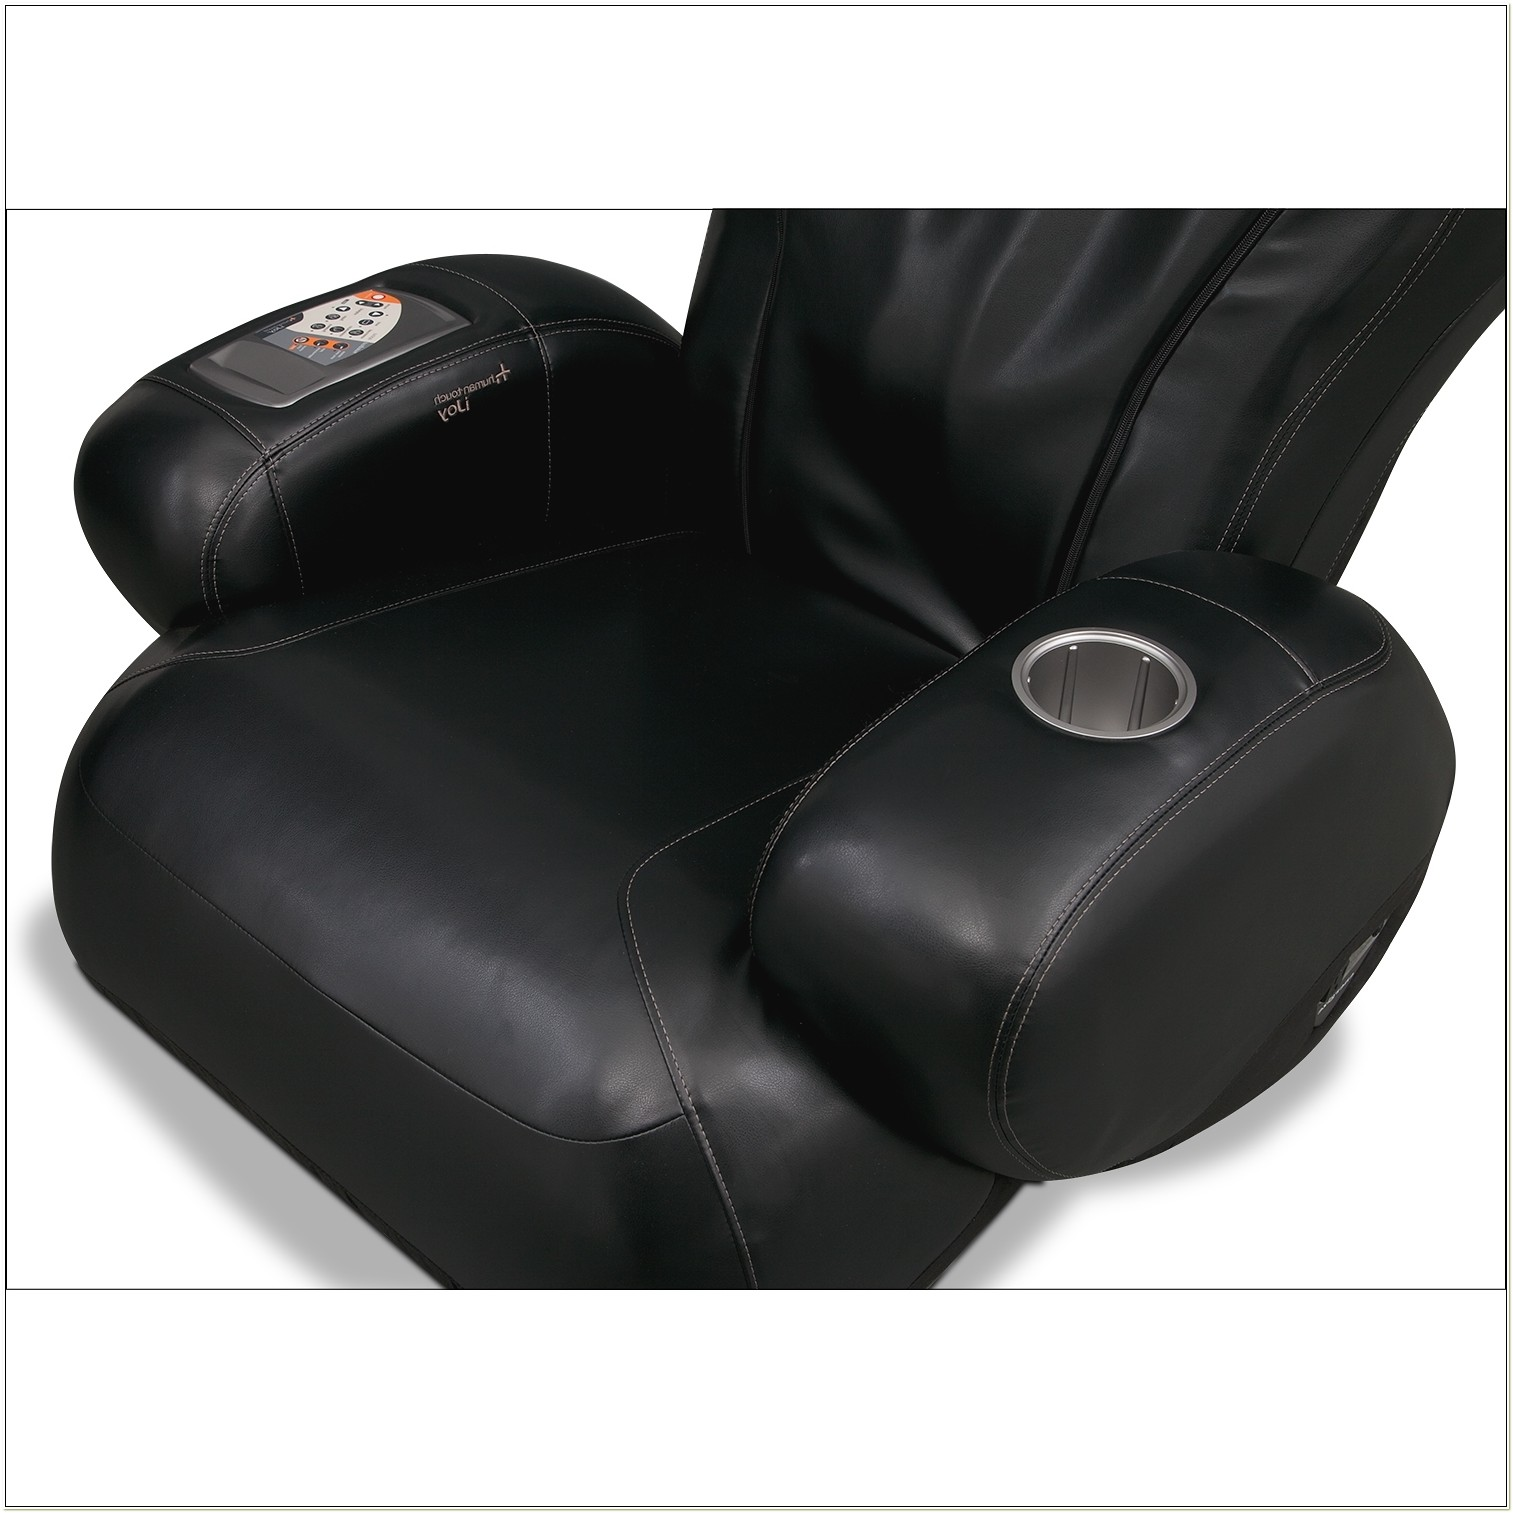 Ijoy 250 Turbo 2 Massage Chair